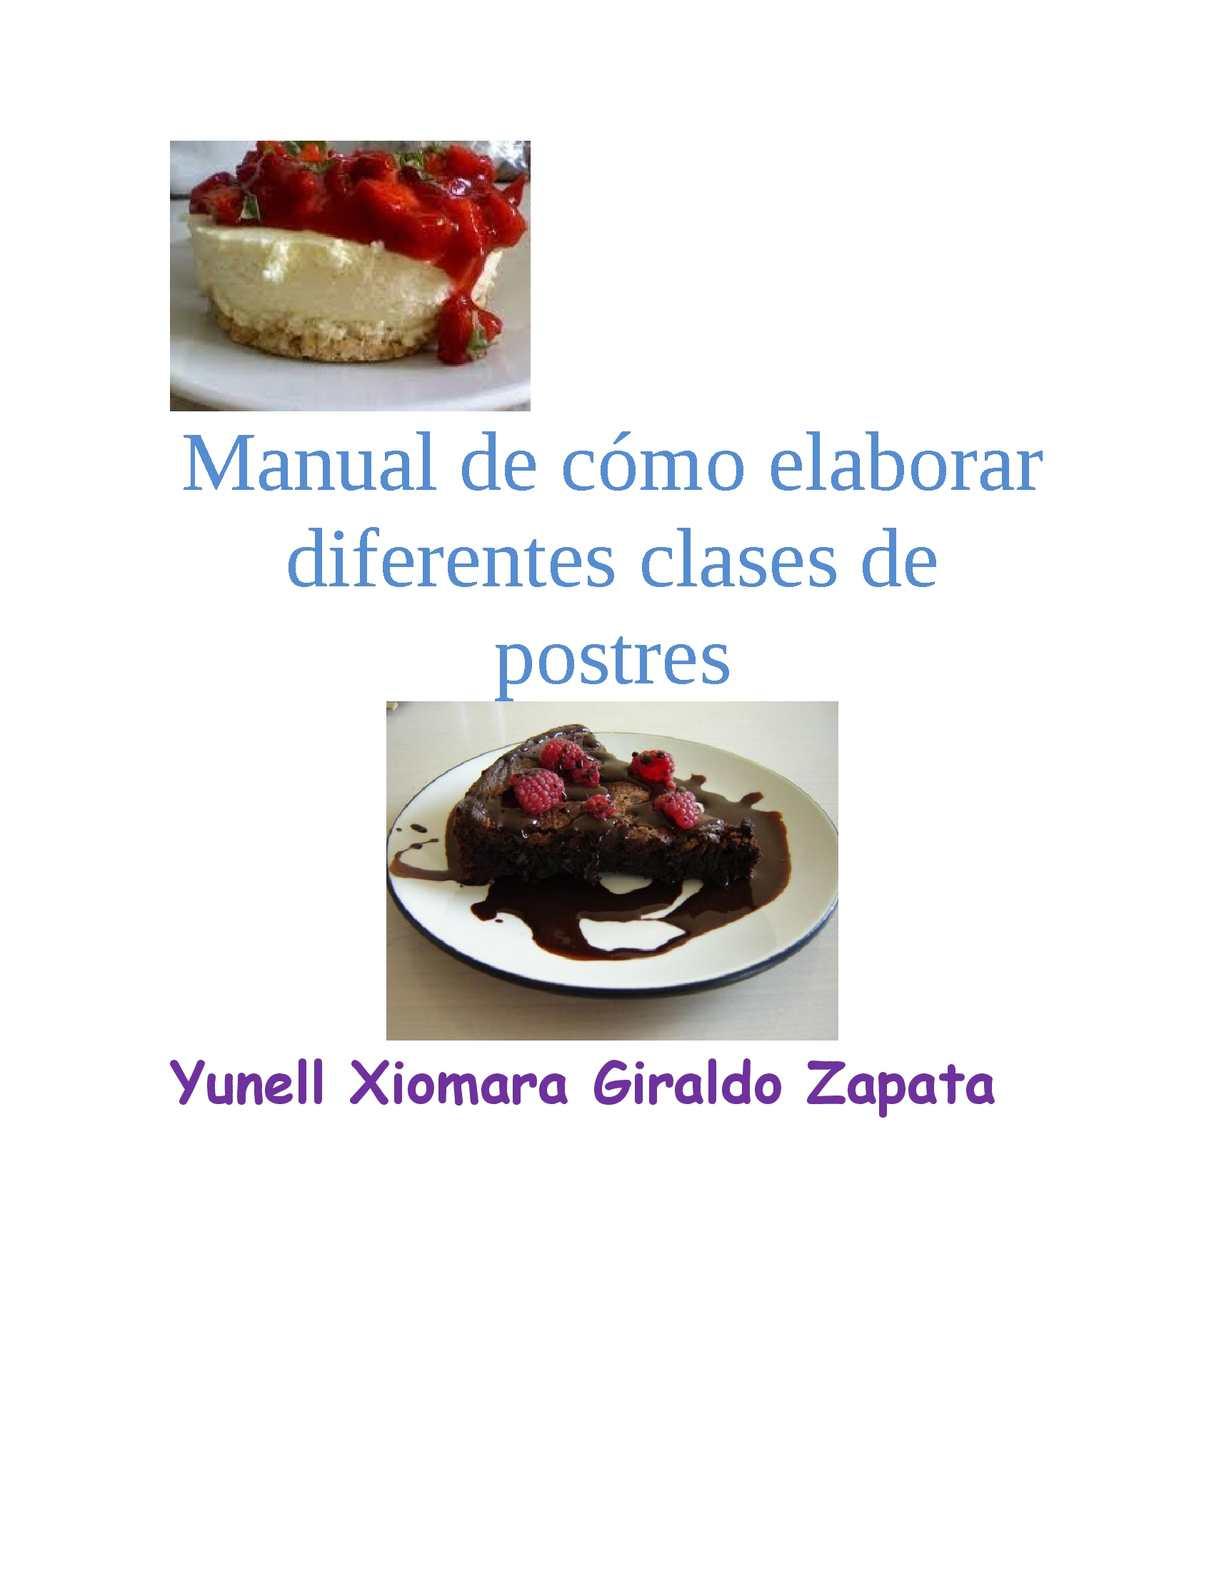 manual de como elaborar diferentes clases de postres